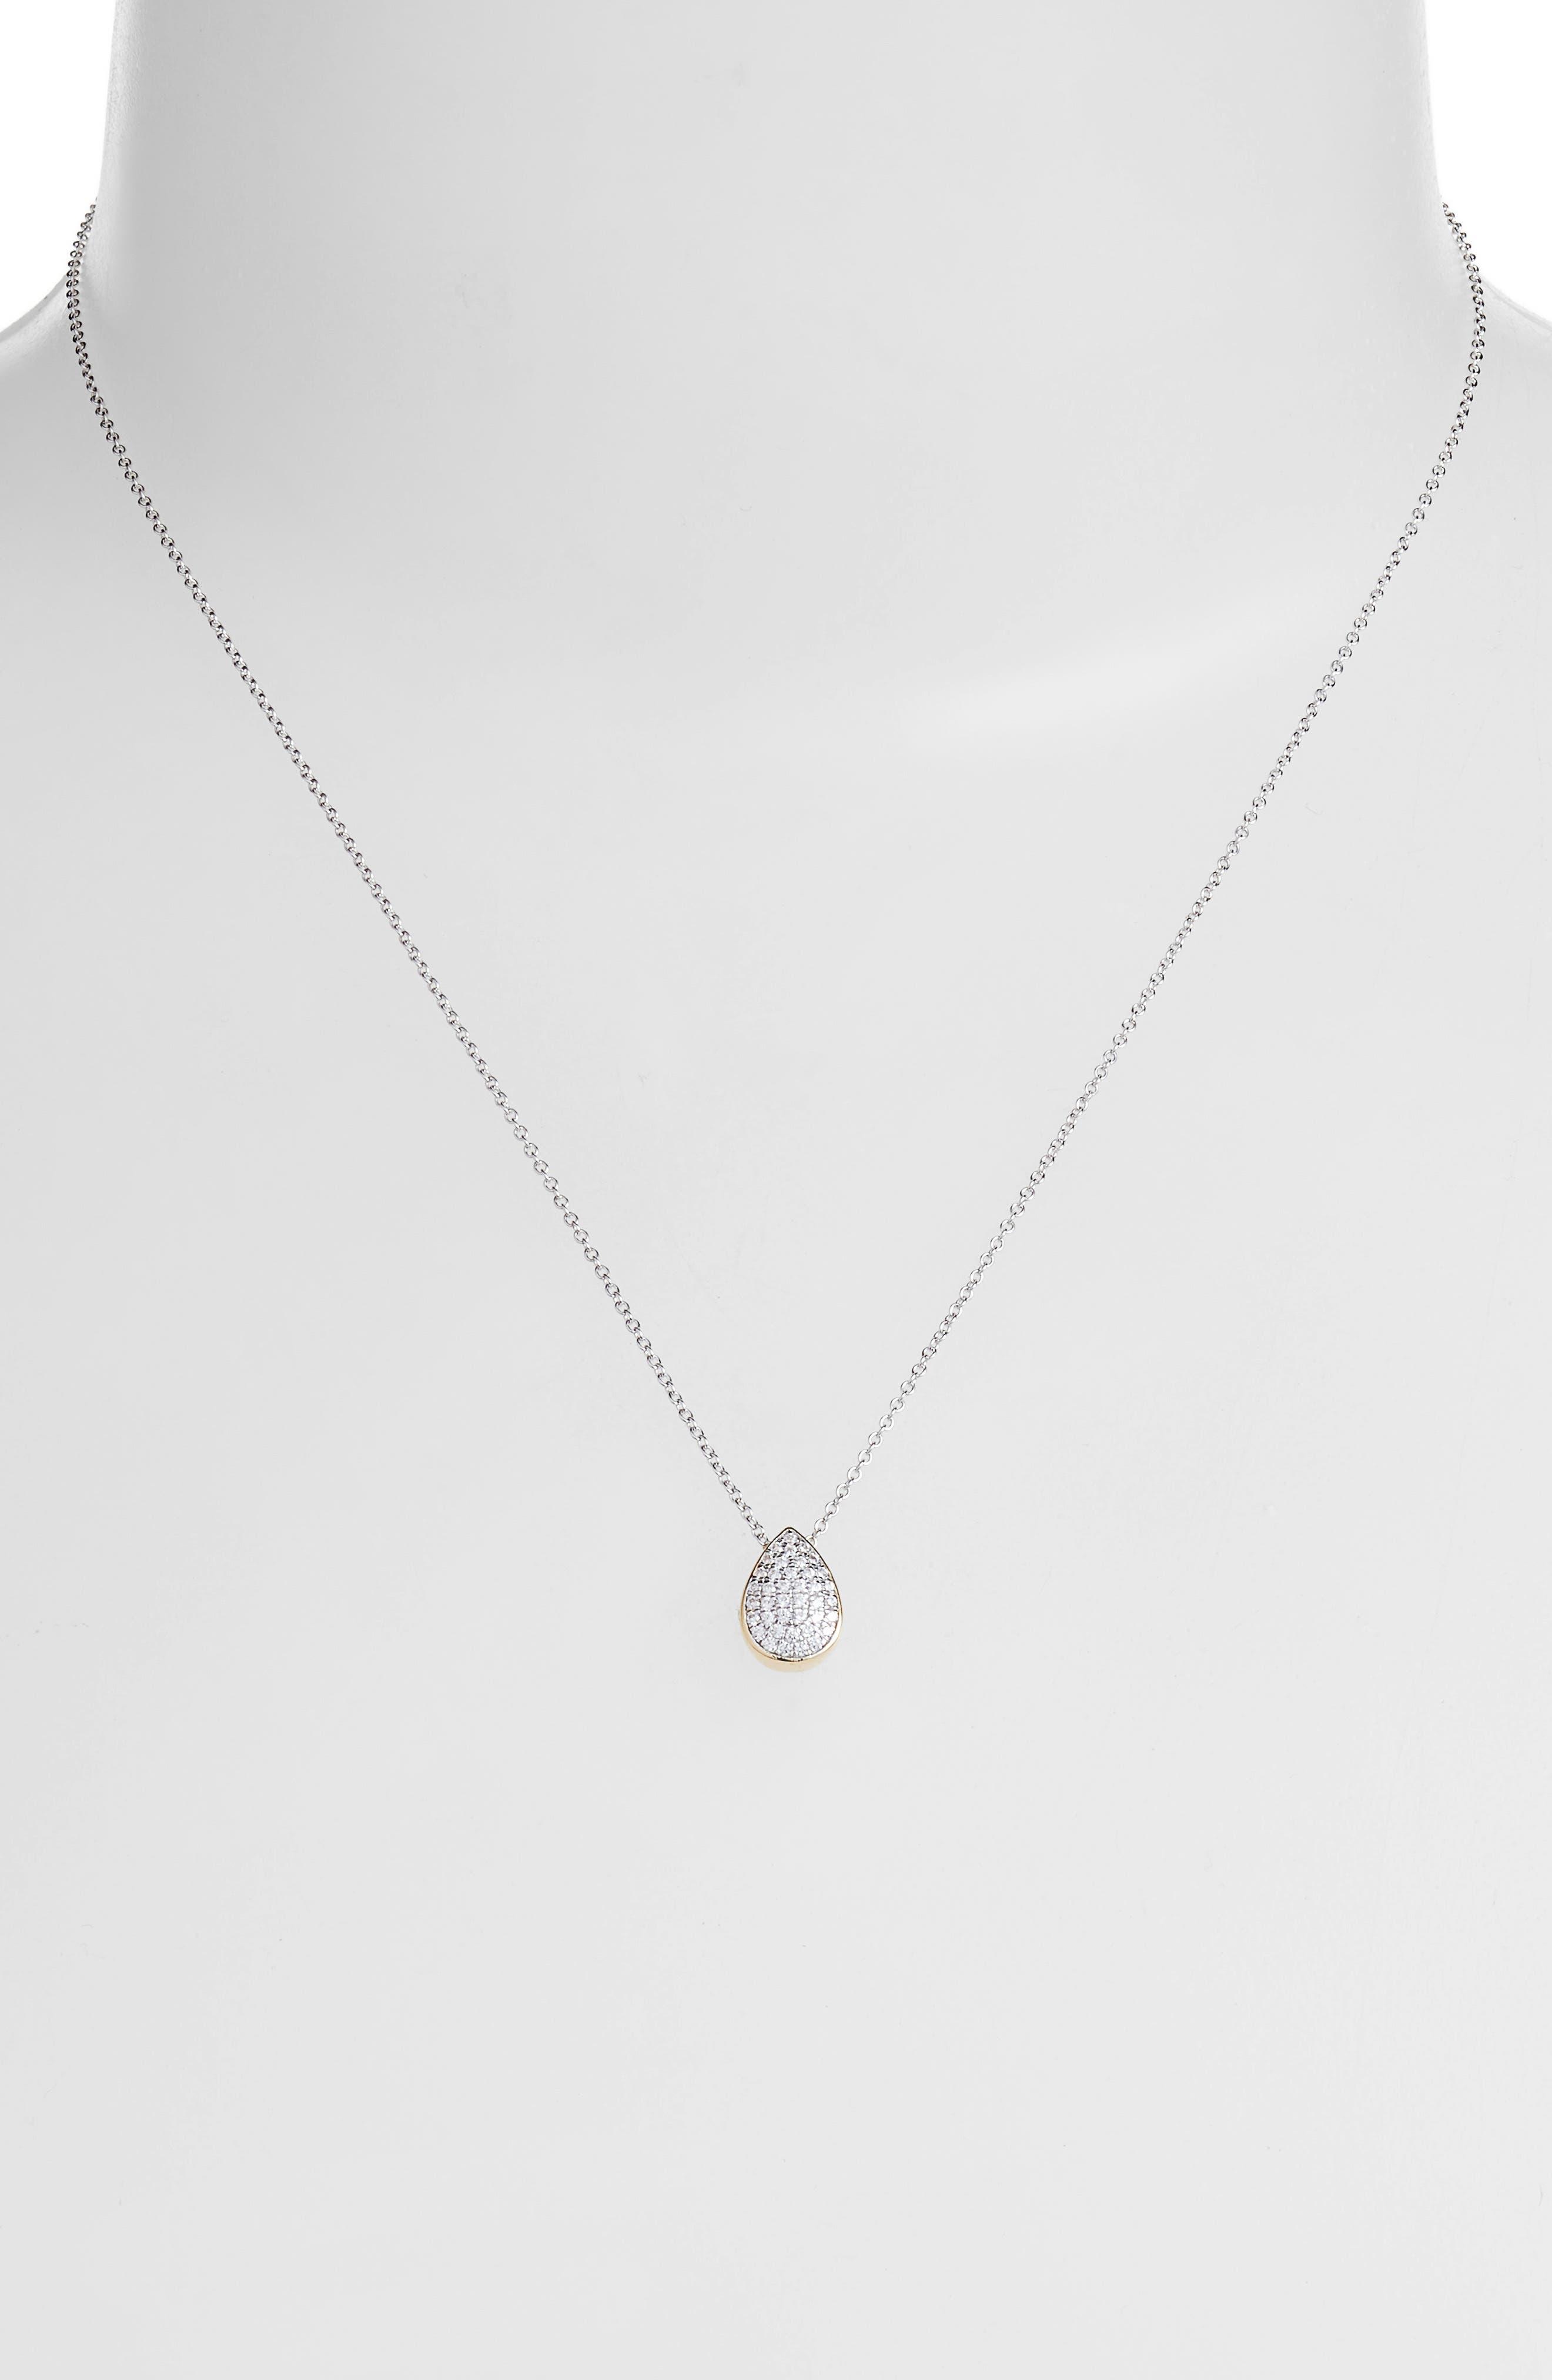 Lafonn Two-Tone Pear Shape Choker Necklace